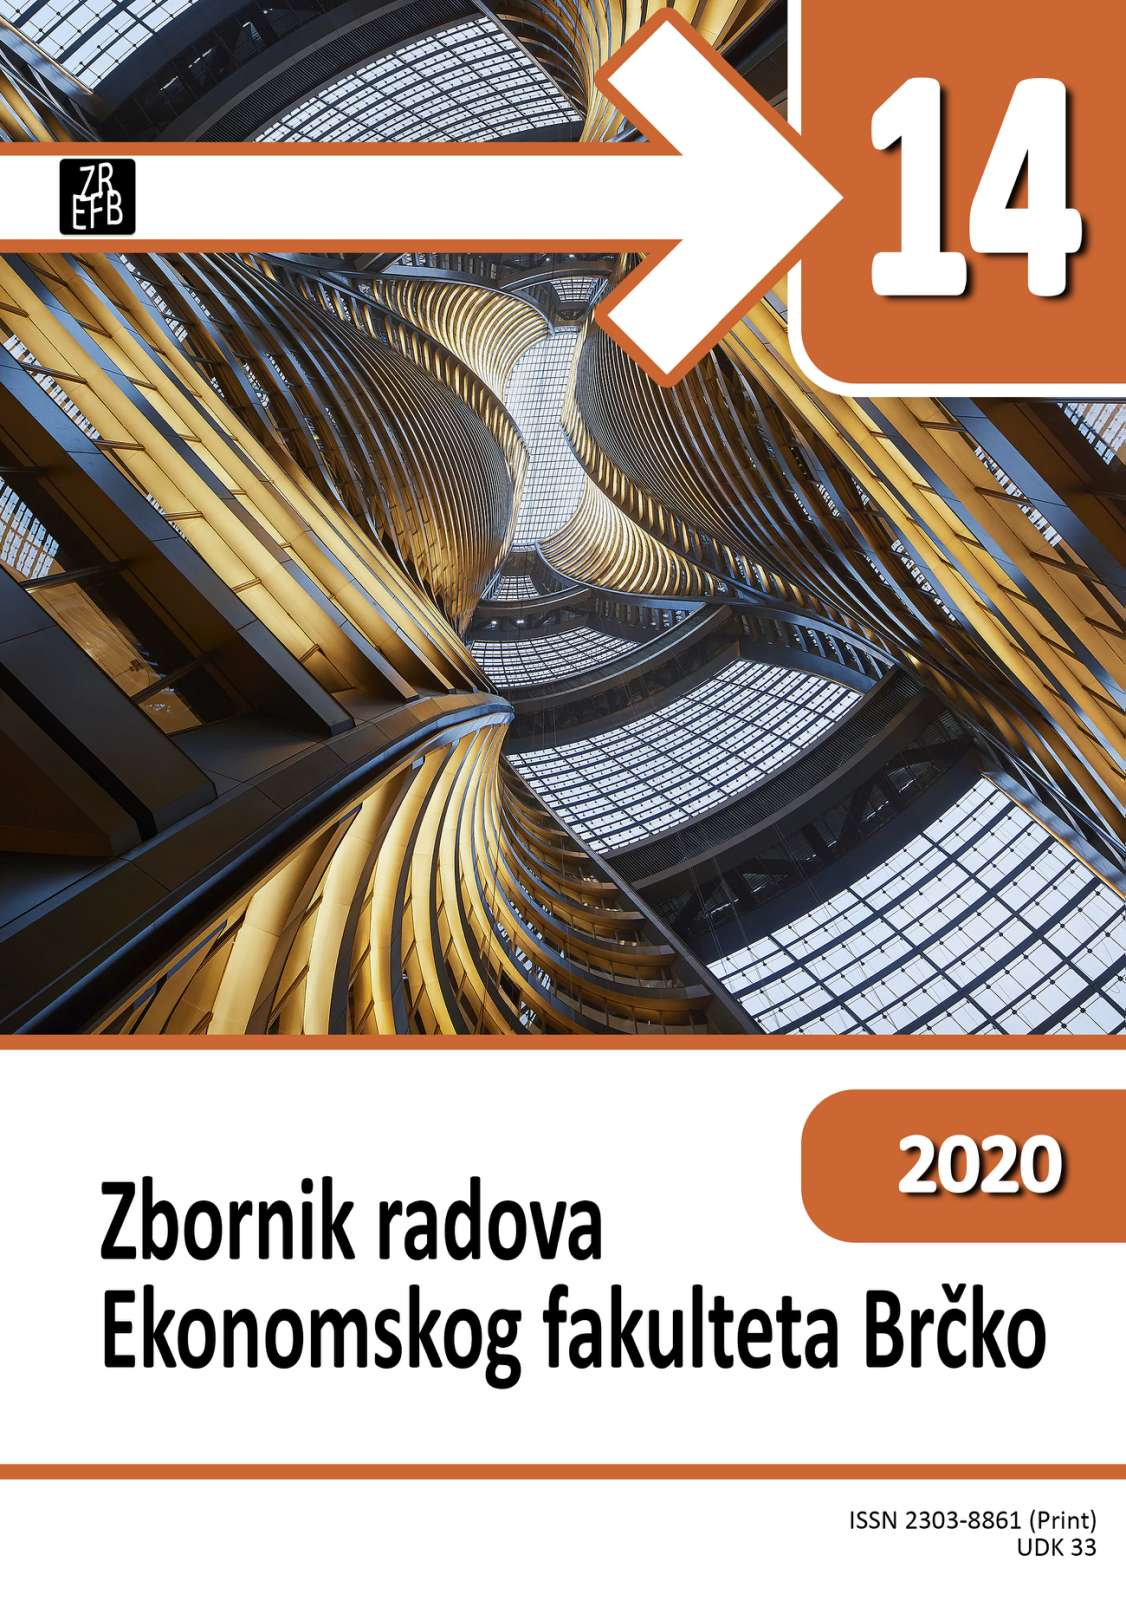 View No. 14 (2020): ZBORNIK RADOVA EKONOMSKOG FAKULTETA BRČKO